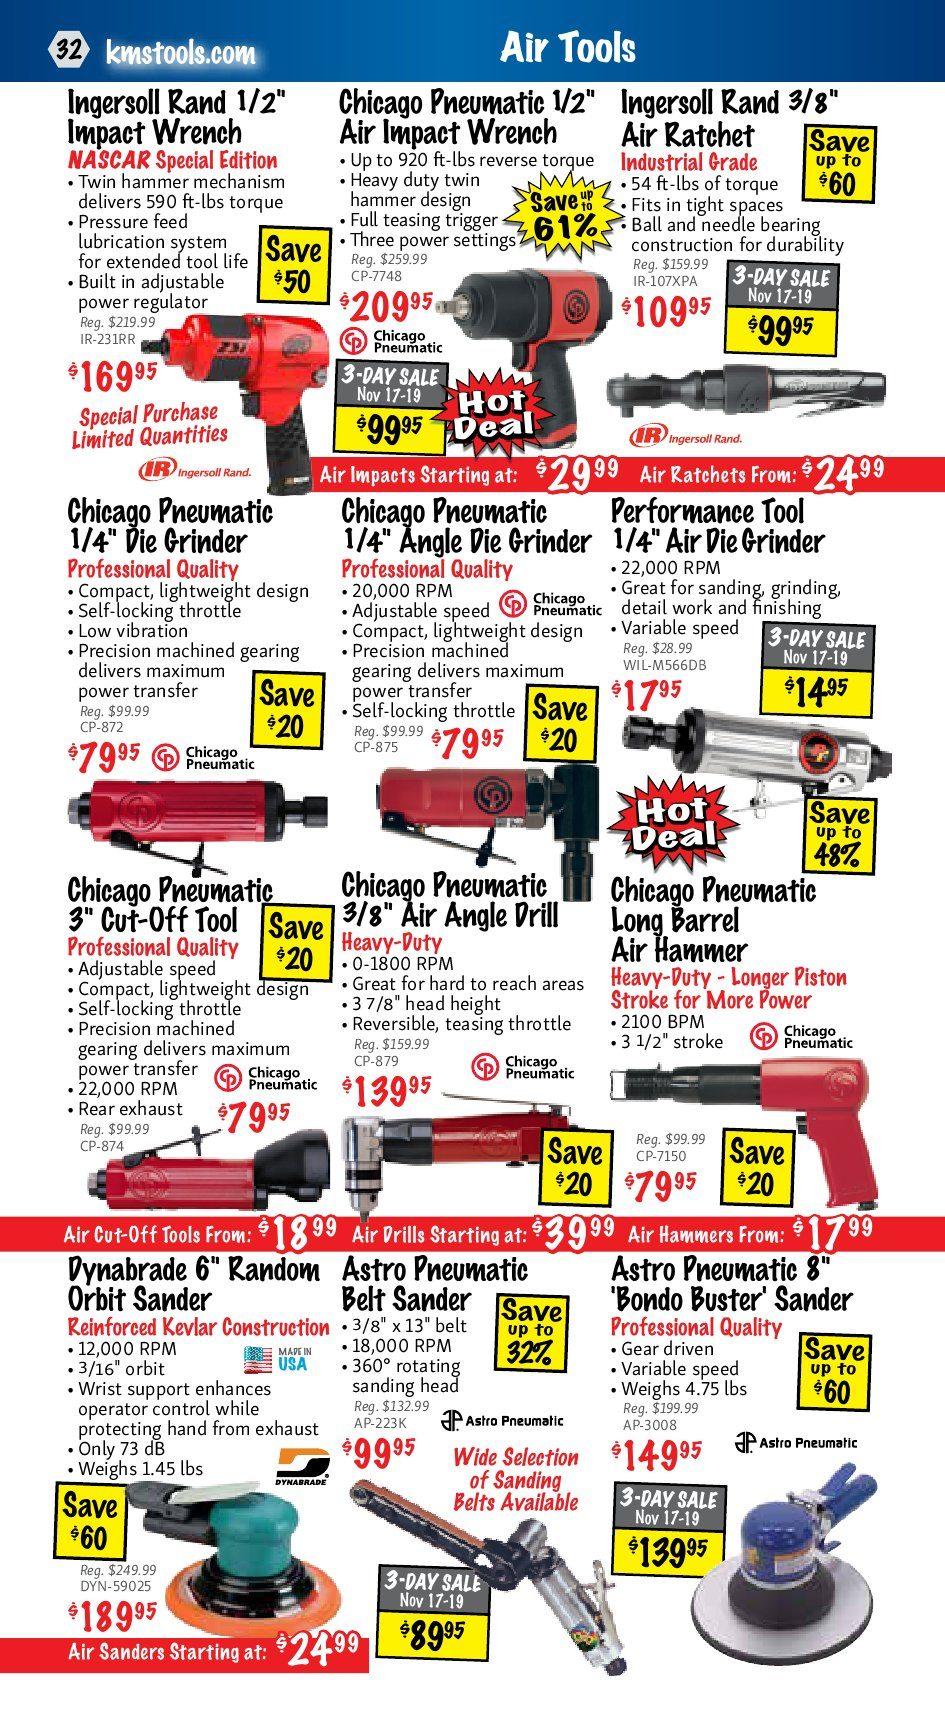 Kms Tools Weekly Flyer Club Month Sale Nov 1 30 Noga Power Indicator Guard